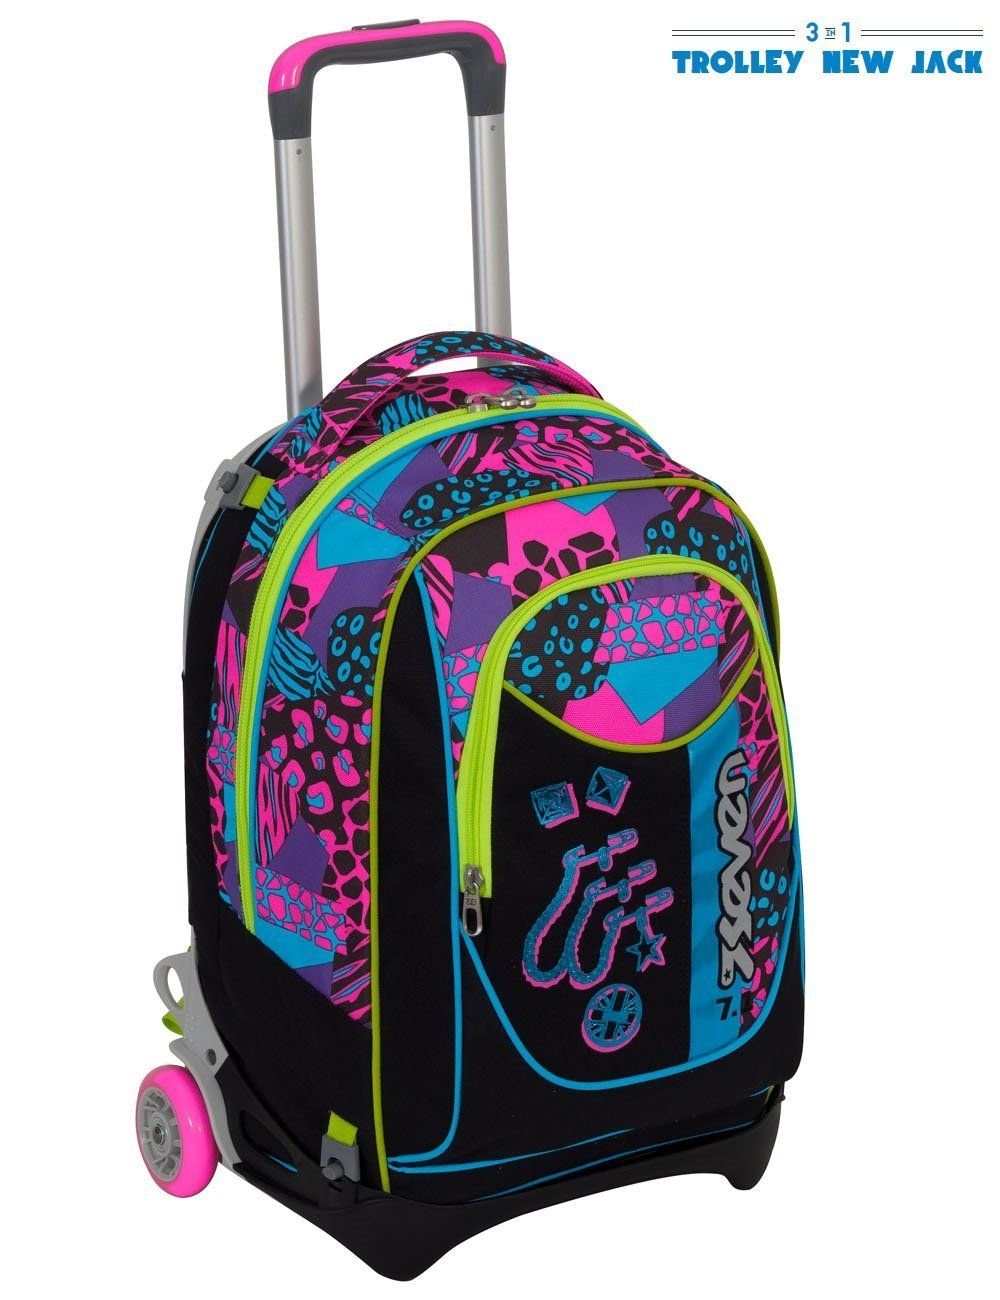 8d16bd9dd9 Trolley Seven New Jack - Swag Girl - Nero Rosa - Sganciabile e Lavabile